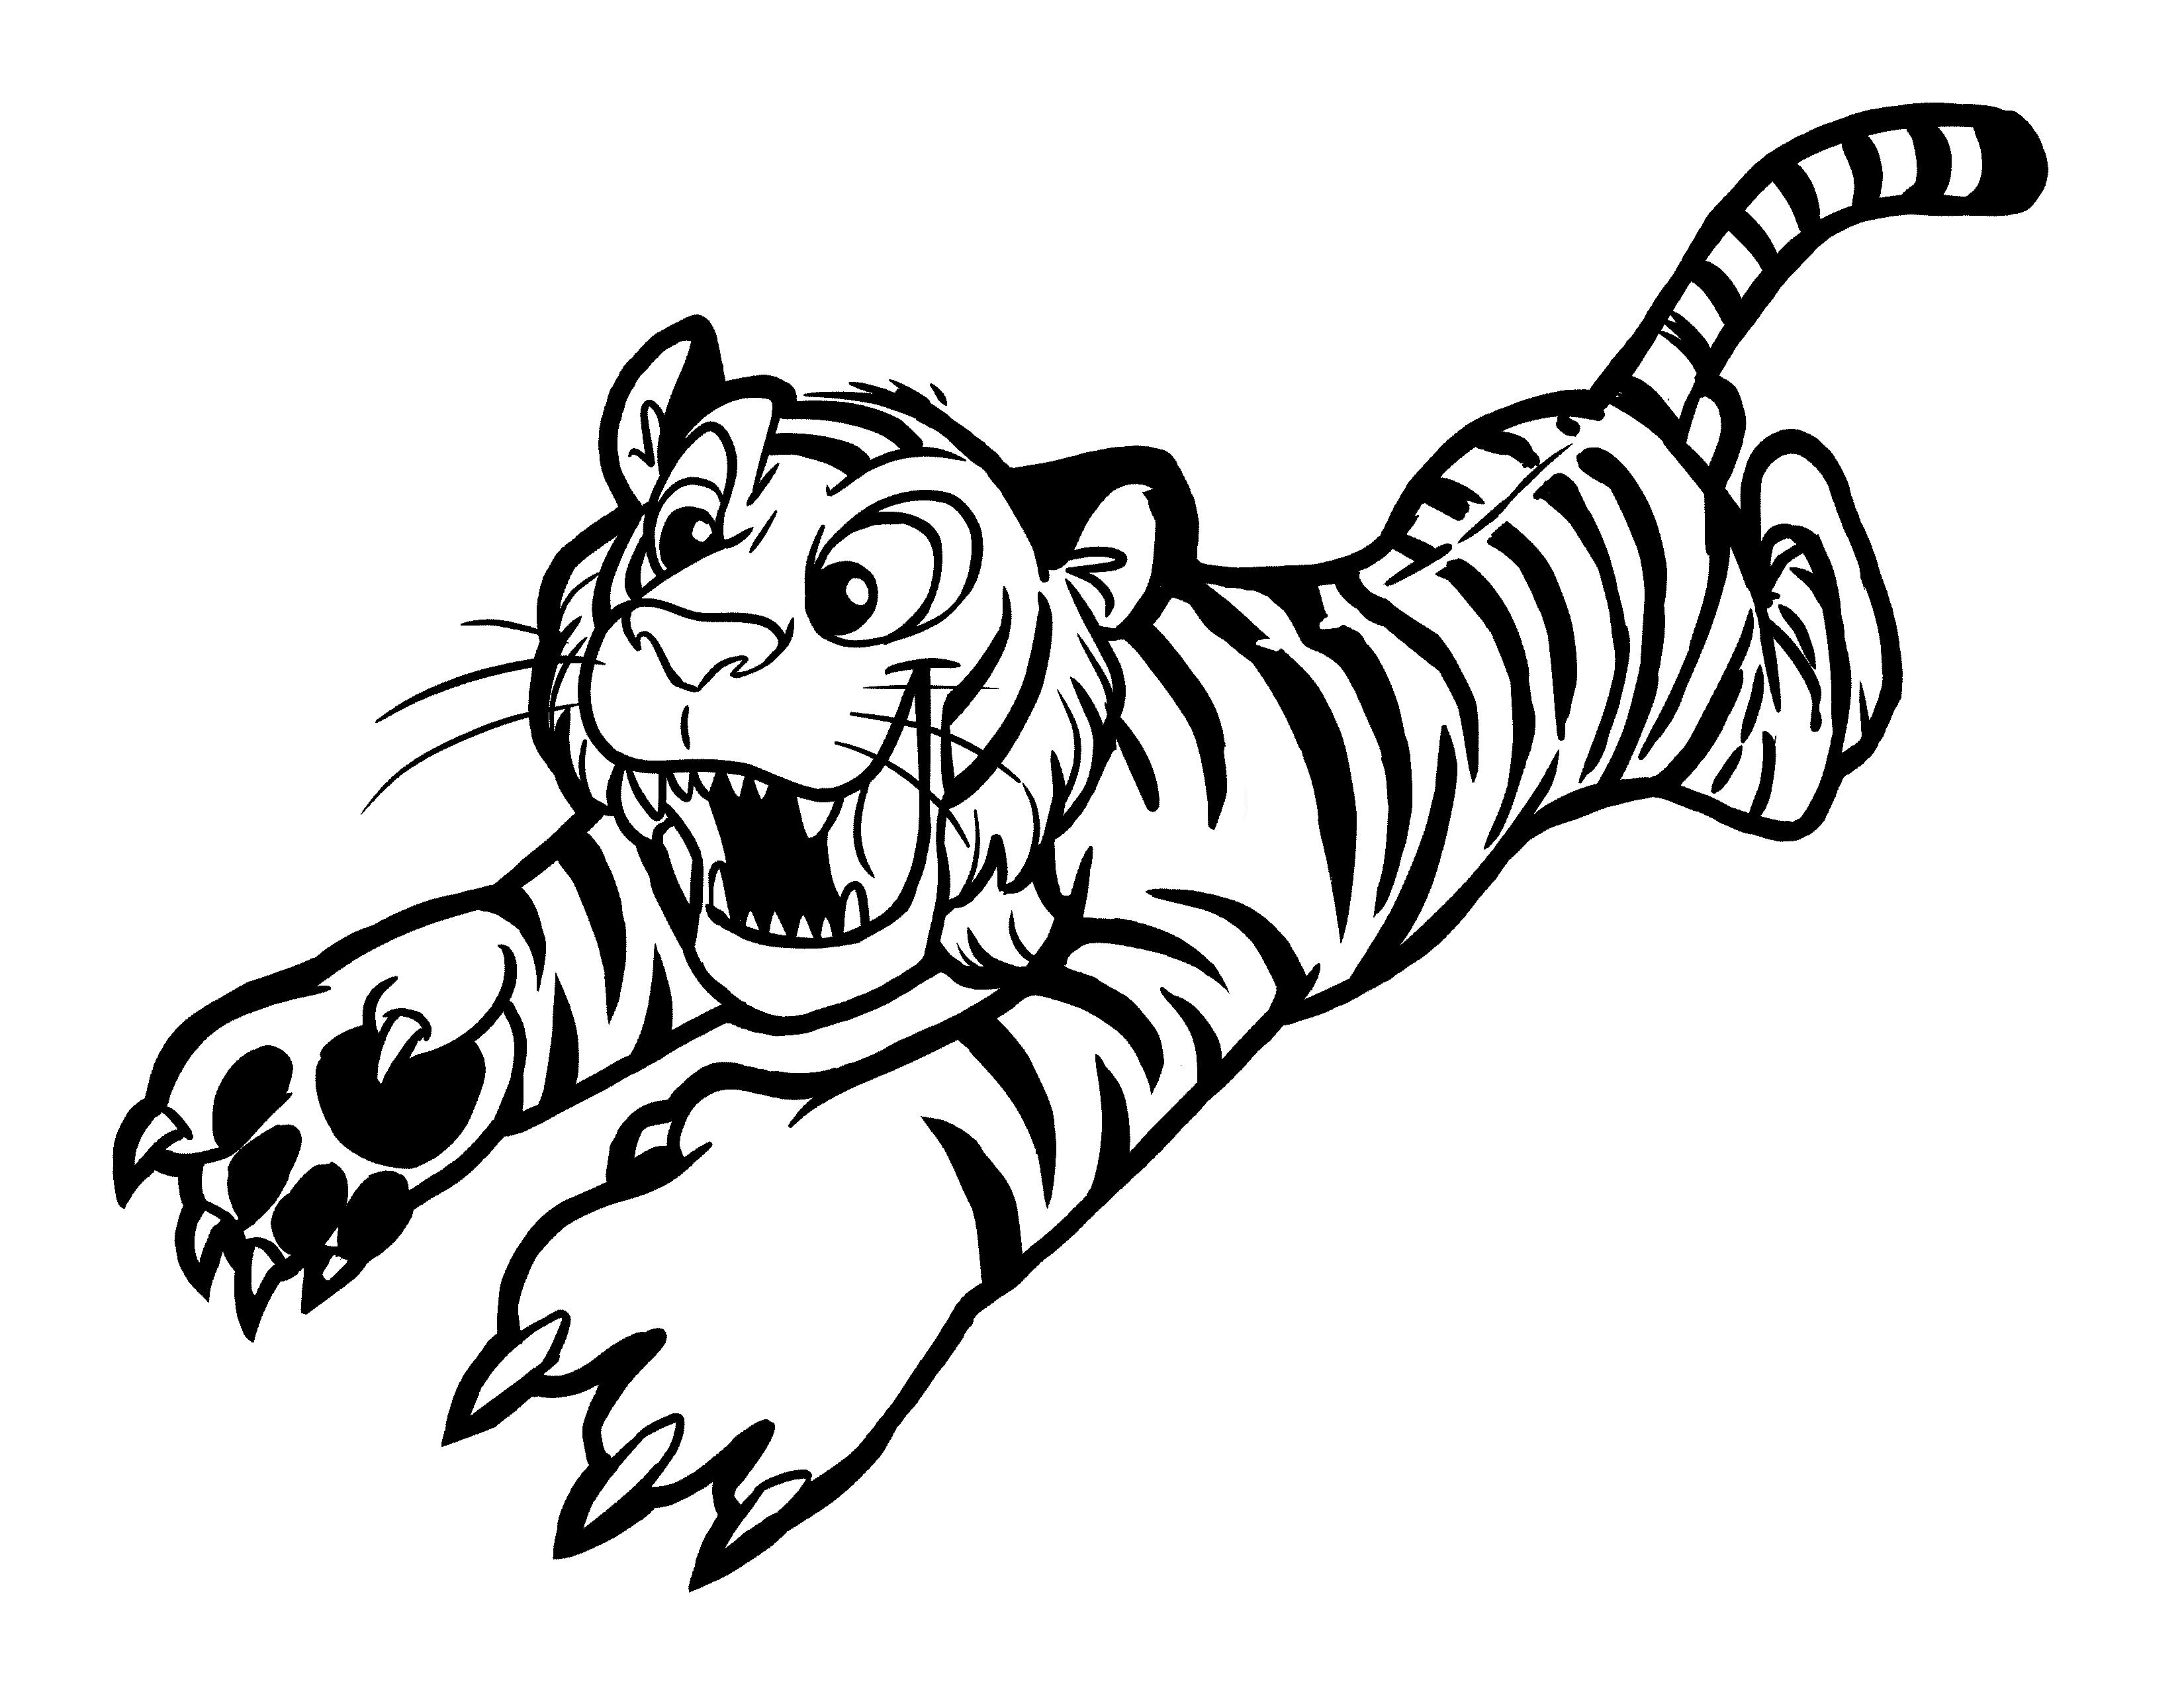 tiger coloring page free printable animal tiger coloring pages page tiger coloring